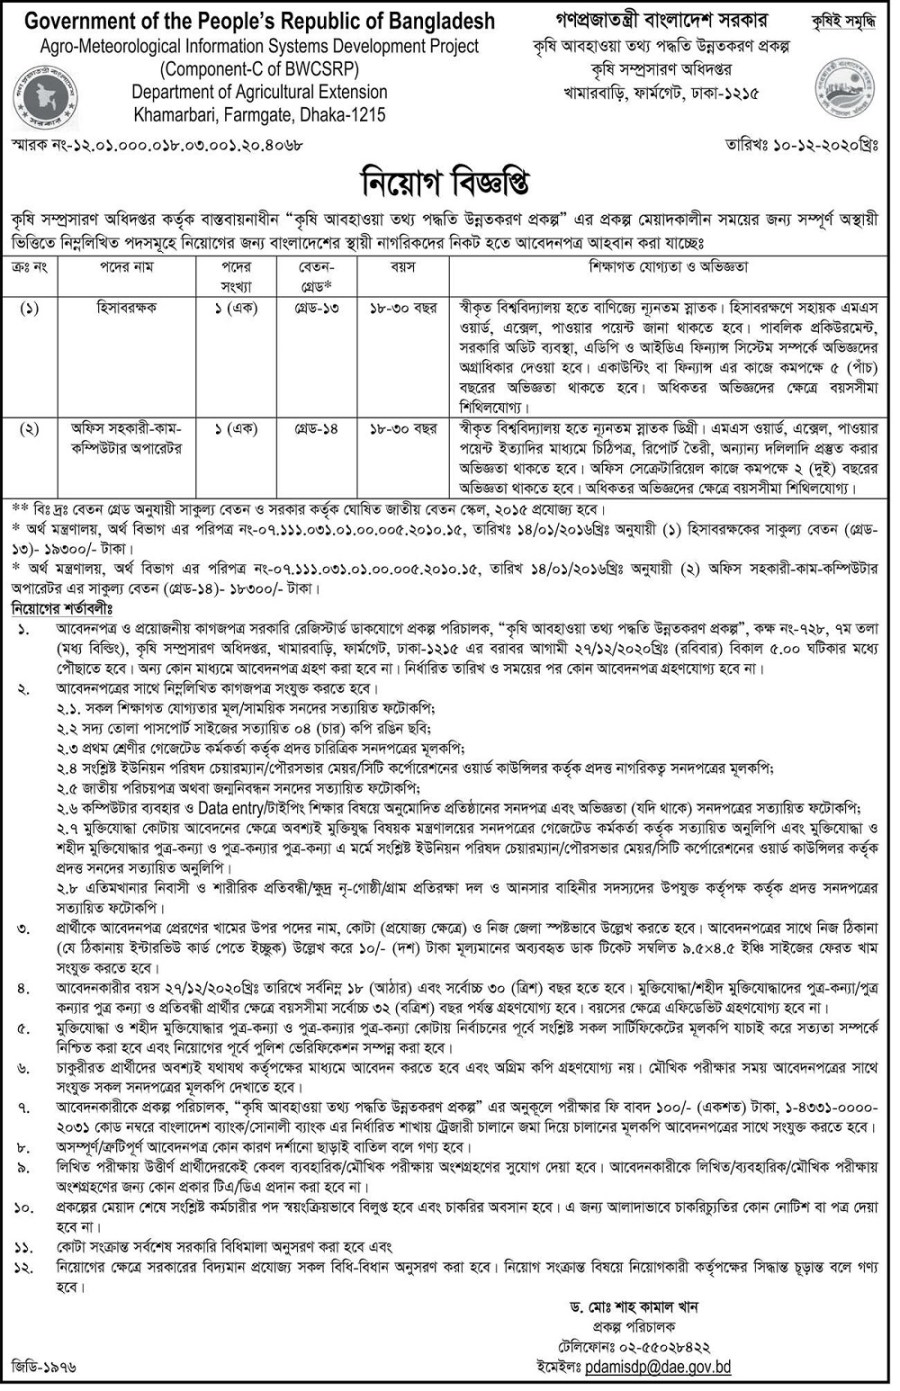 Department of Agricultural Extension Job Circular December 2020